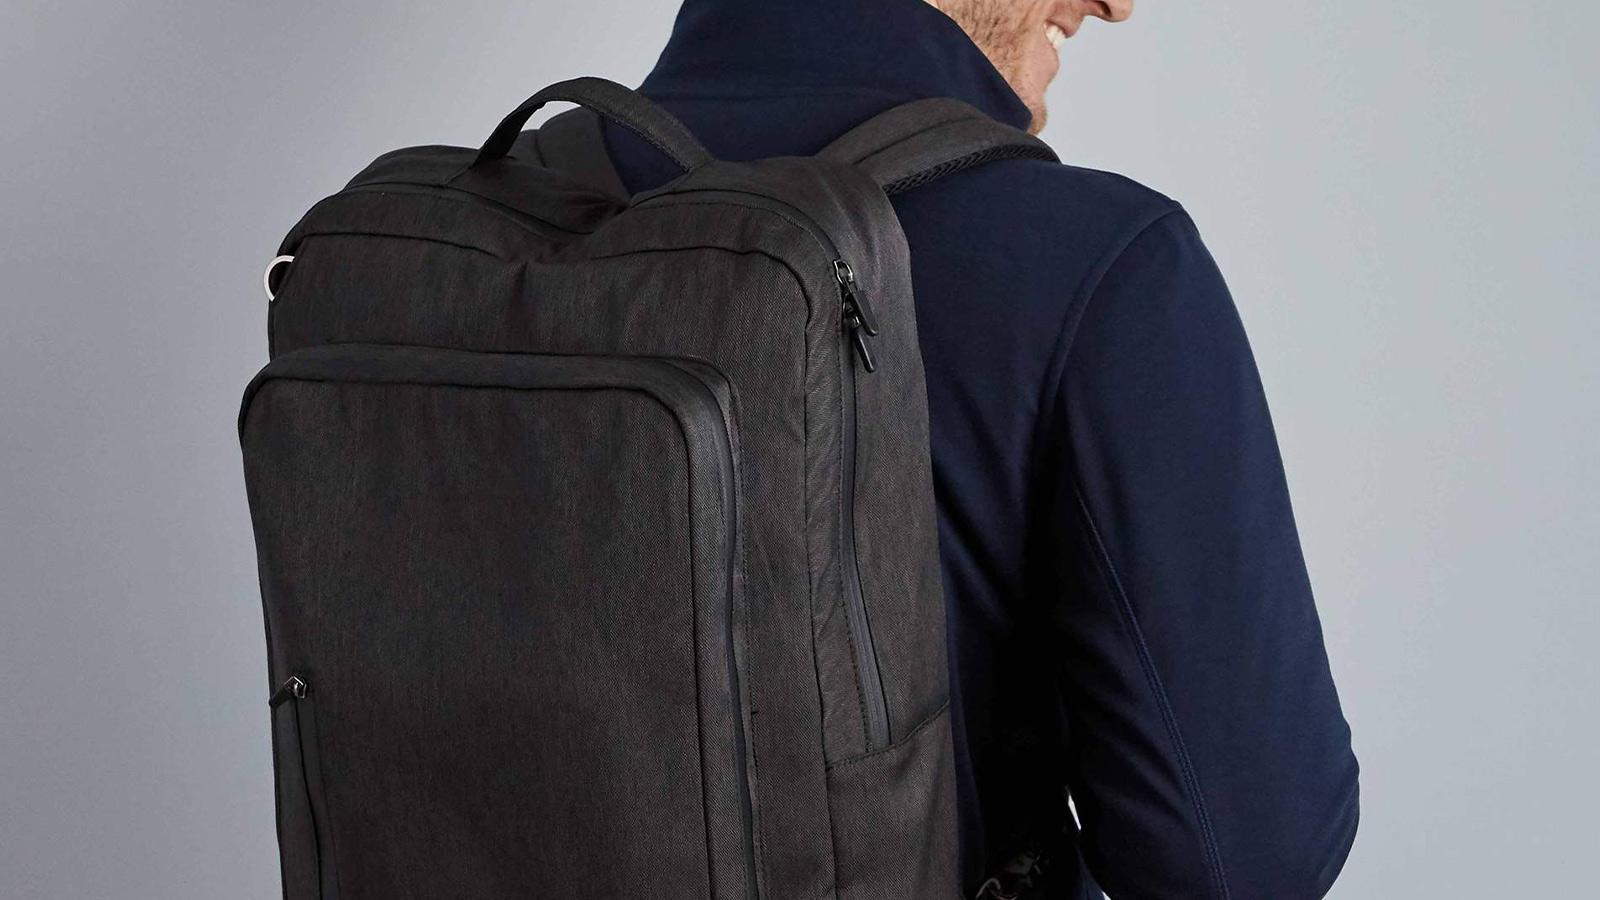 Mack Weldon Ion Convertible Backpack